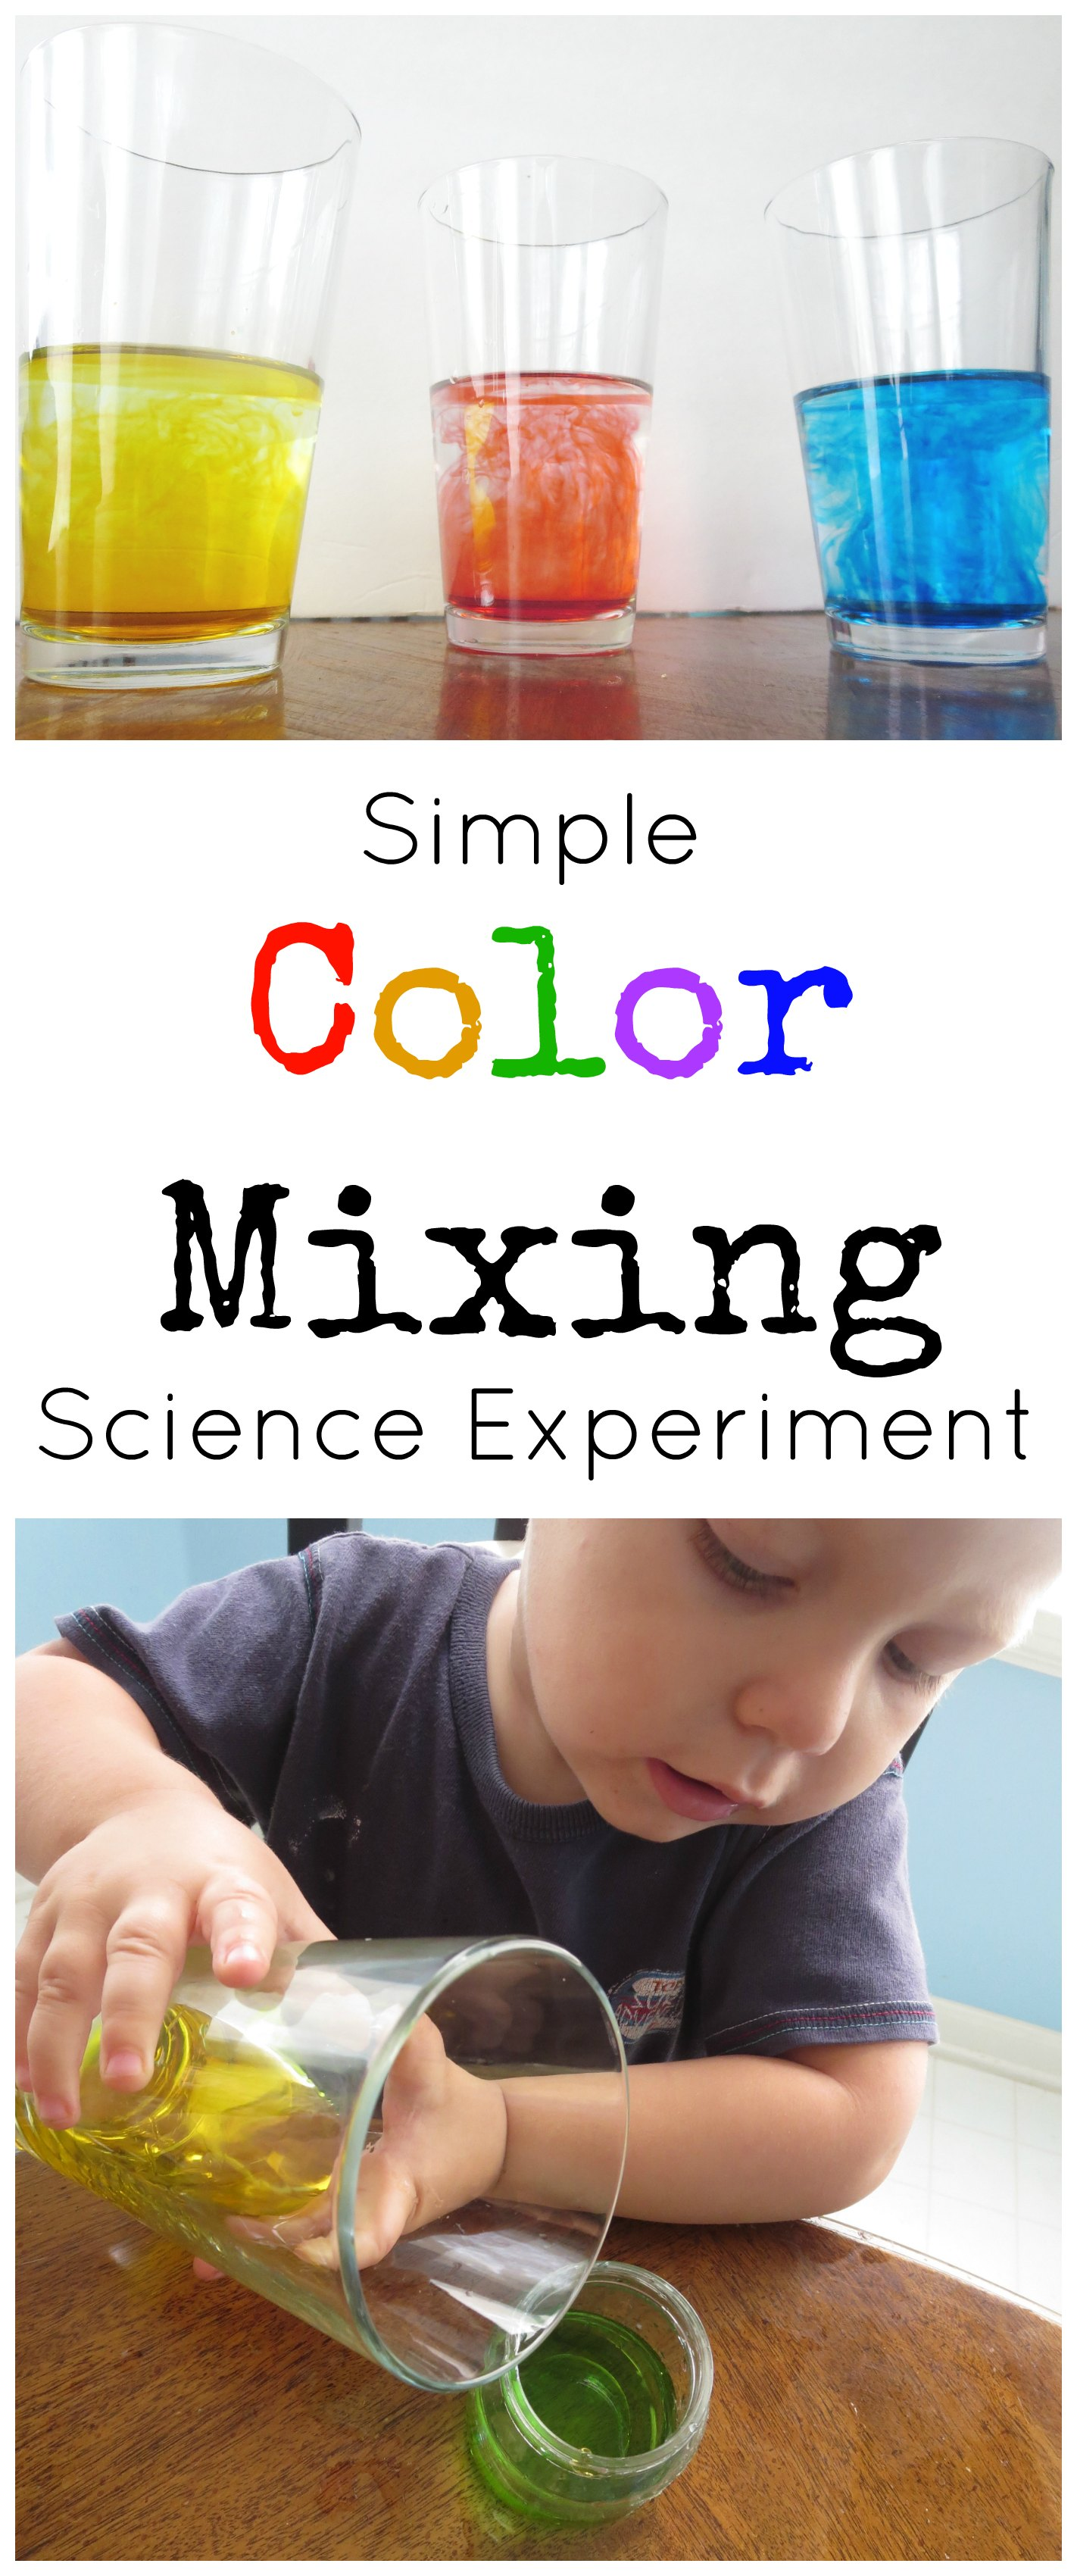 easy science experiments for preschool simple color mixing science experiments for preschoolers 258